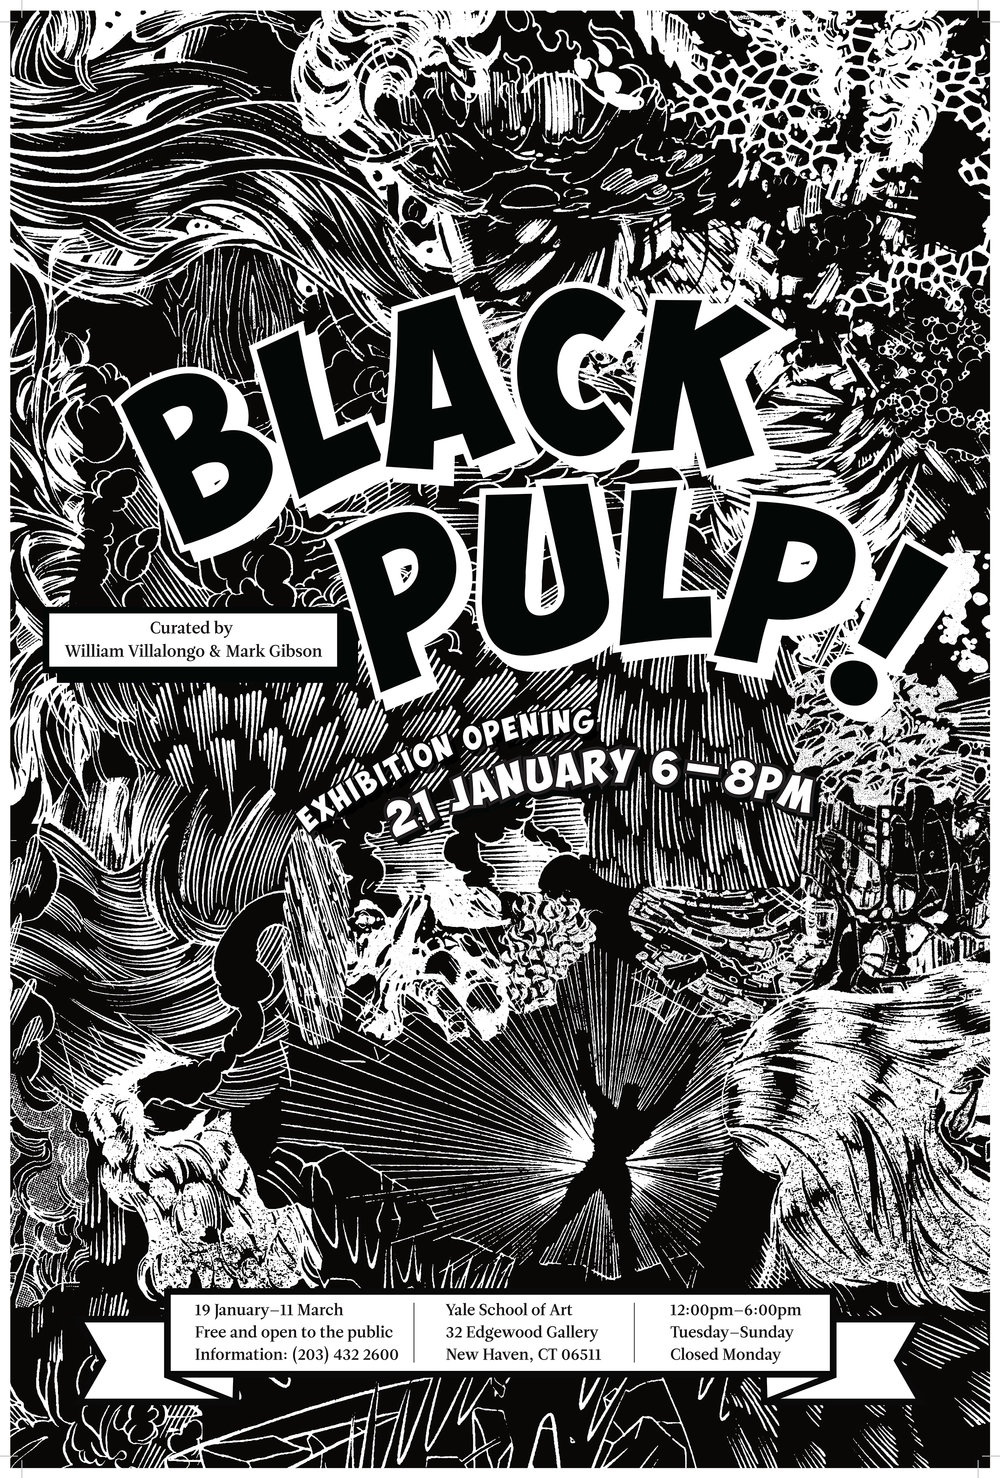 Black-Pulp_POSTER-1 copy.jpg